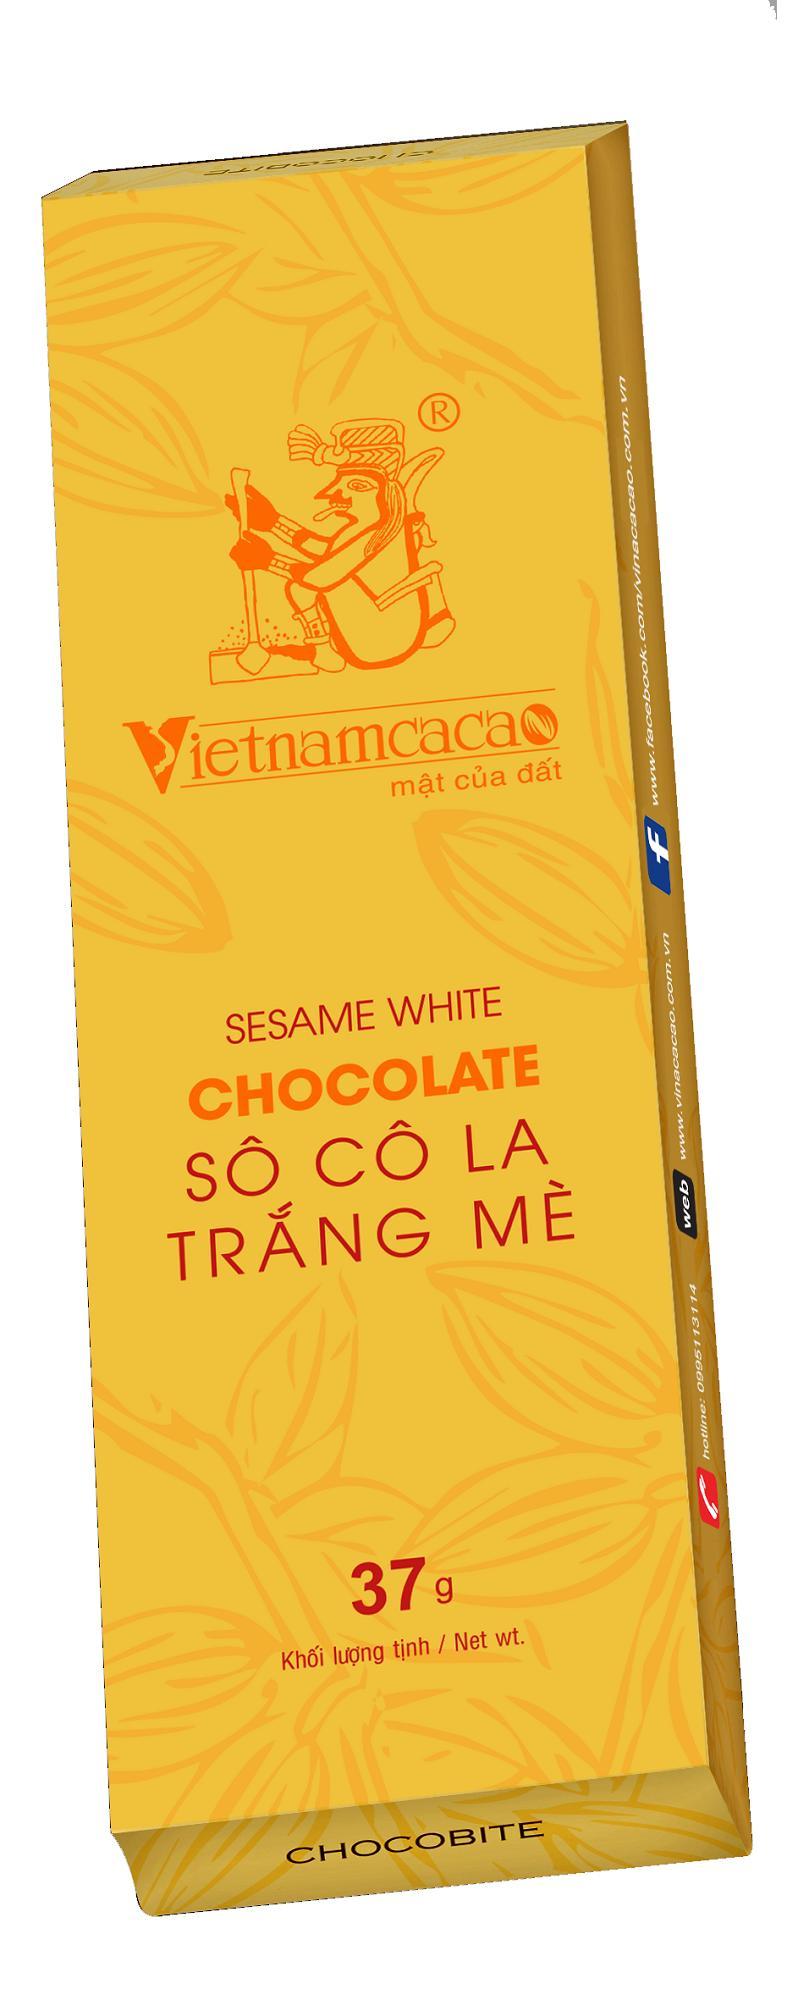 Socola trắng mè chocobite - Vinacacao 37g